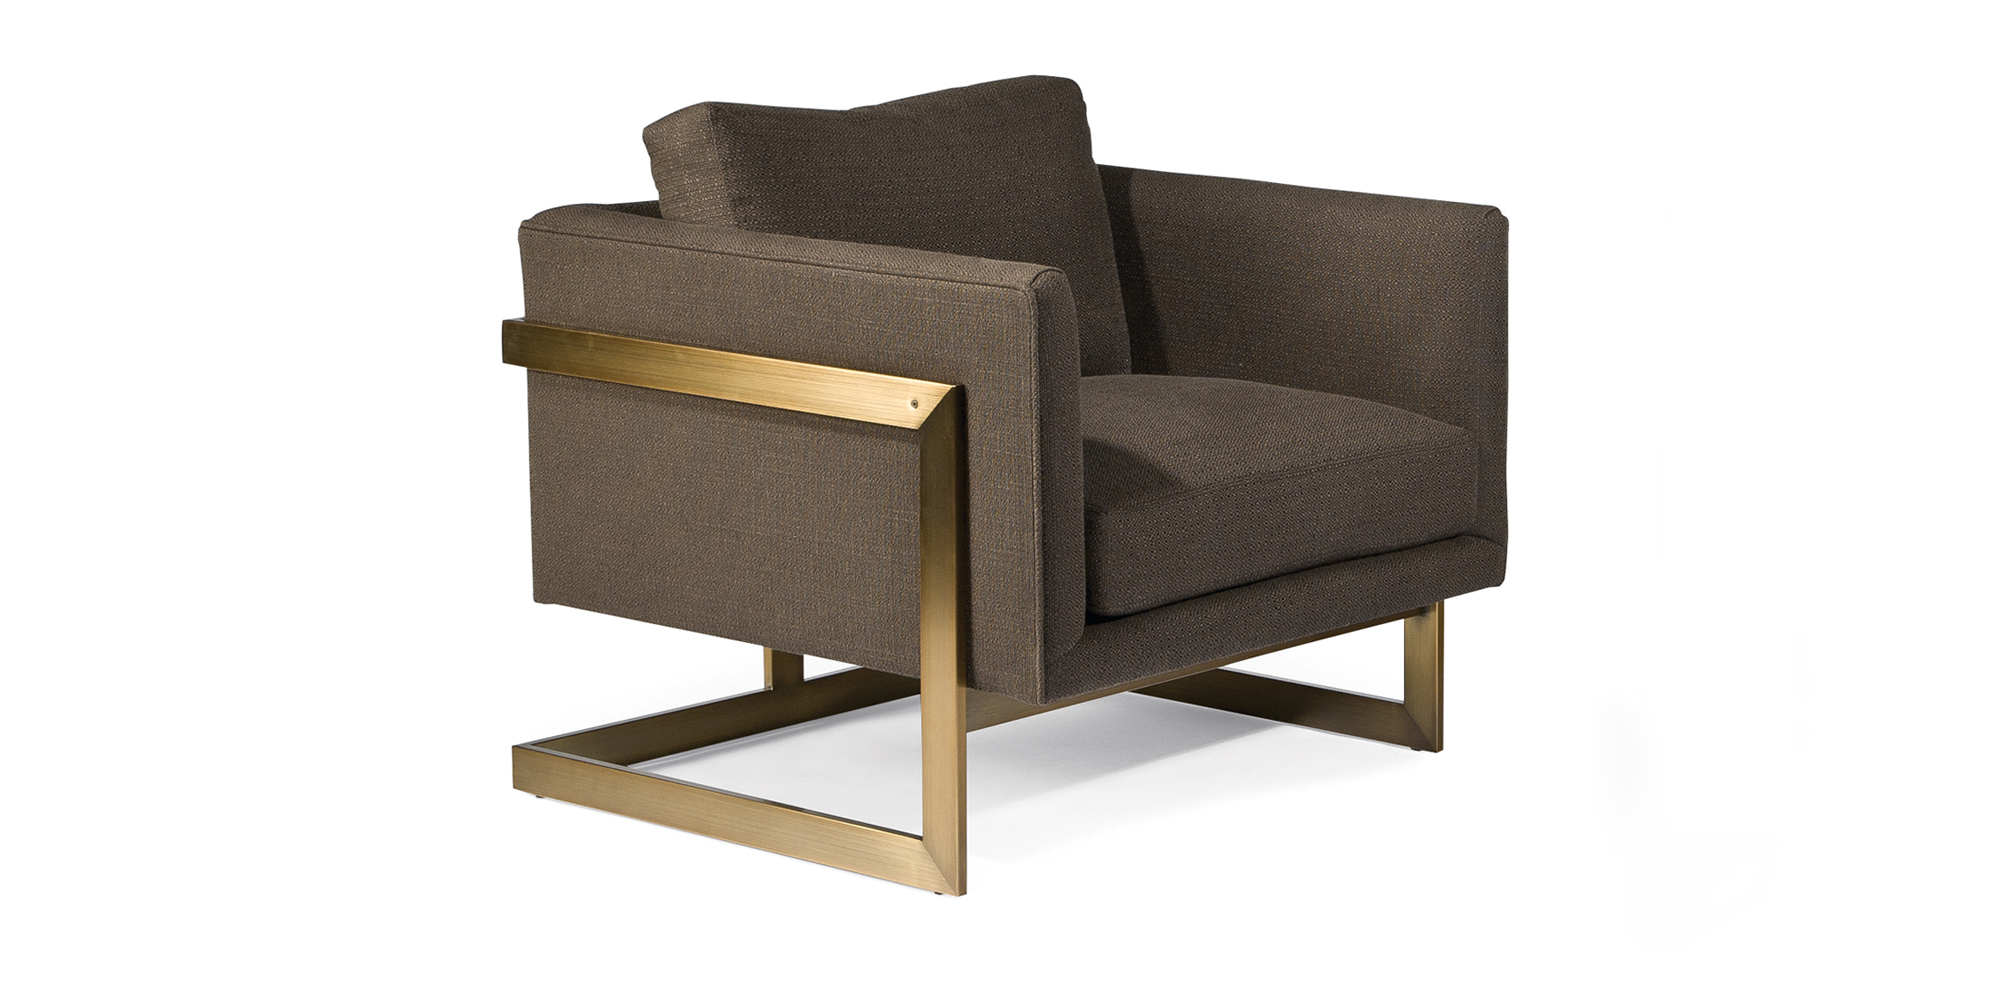 989 Design Classic Lounge Chair (Bronze)